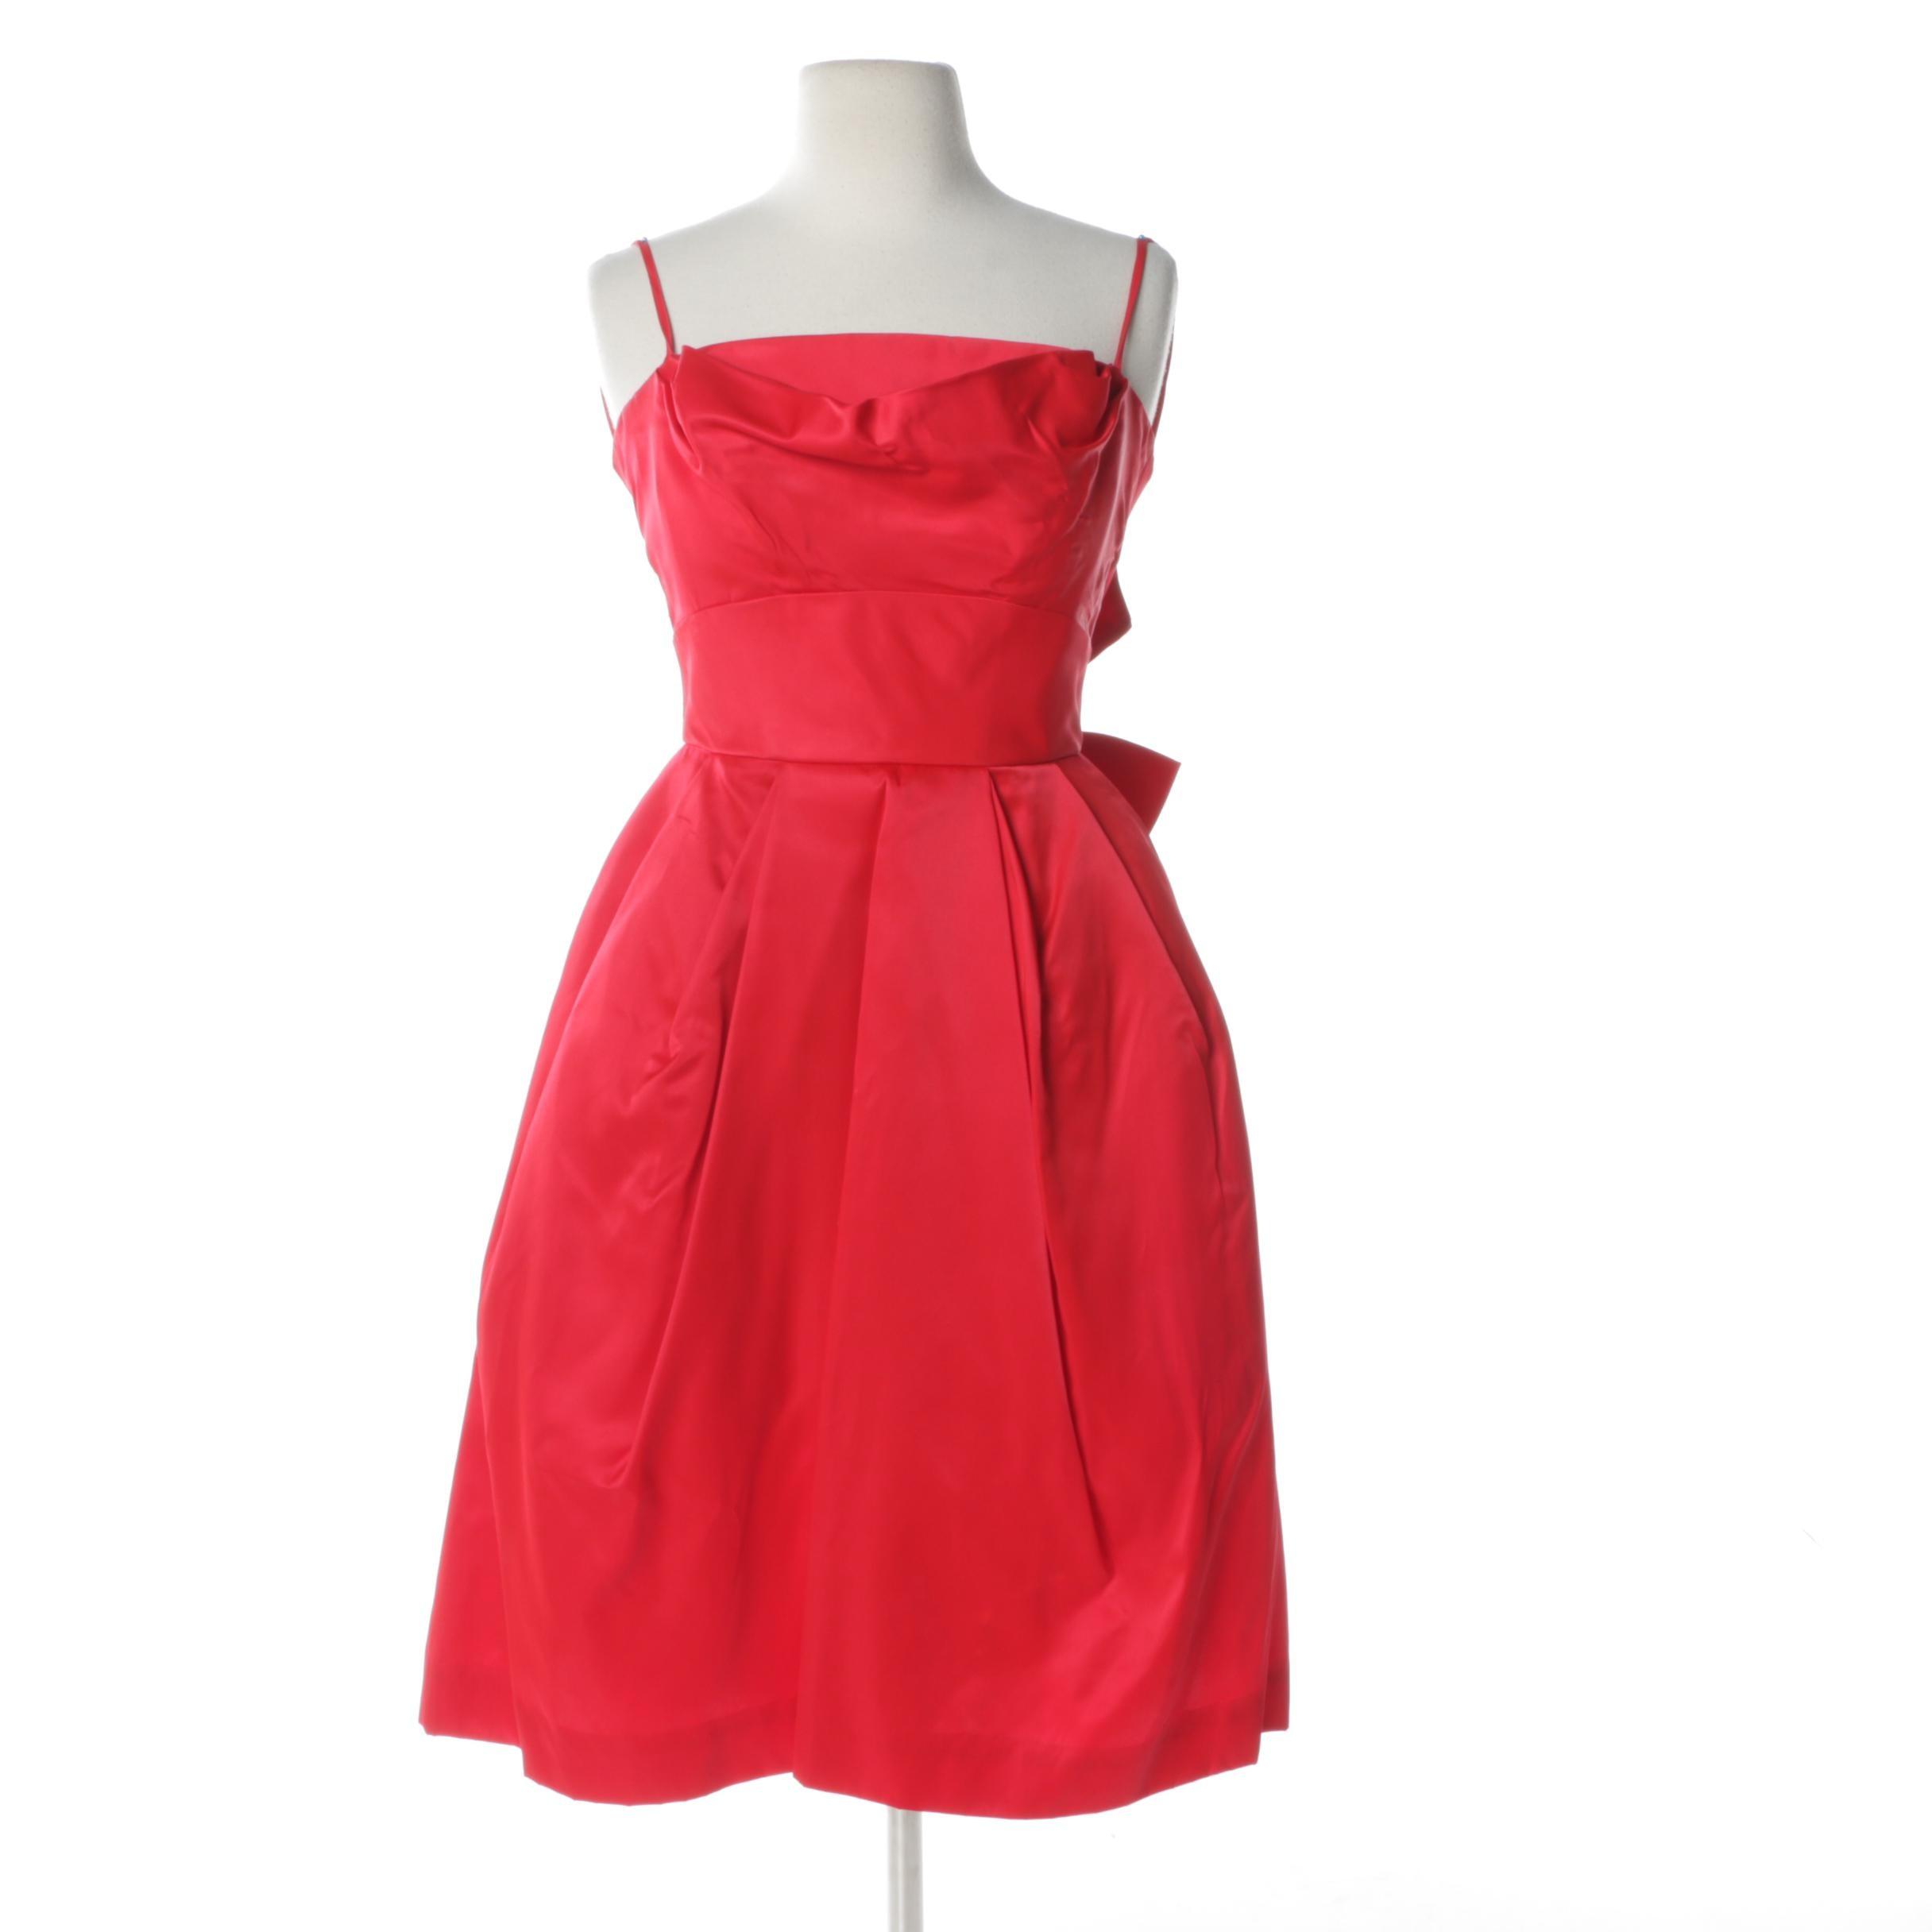 Circa 1960s Lorrie Deb Poppy Red Cocktail Dress